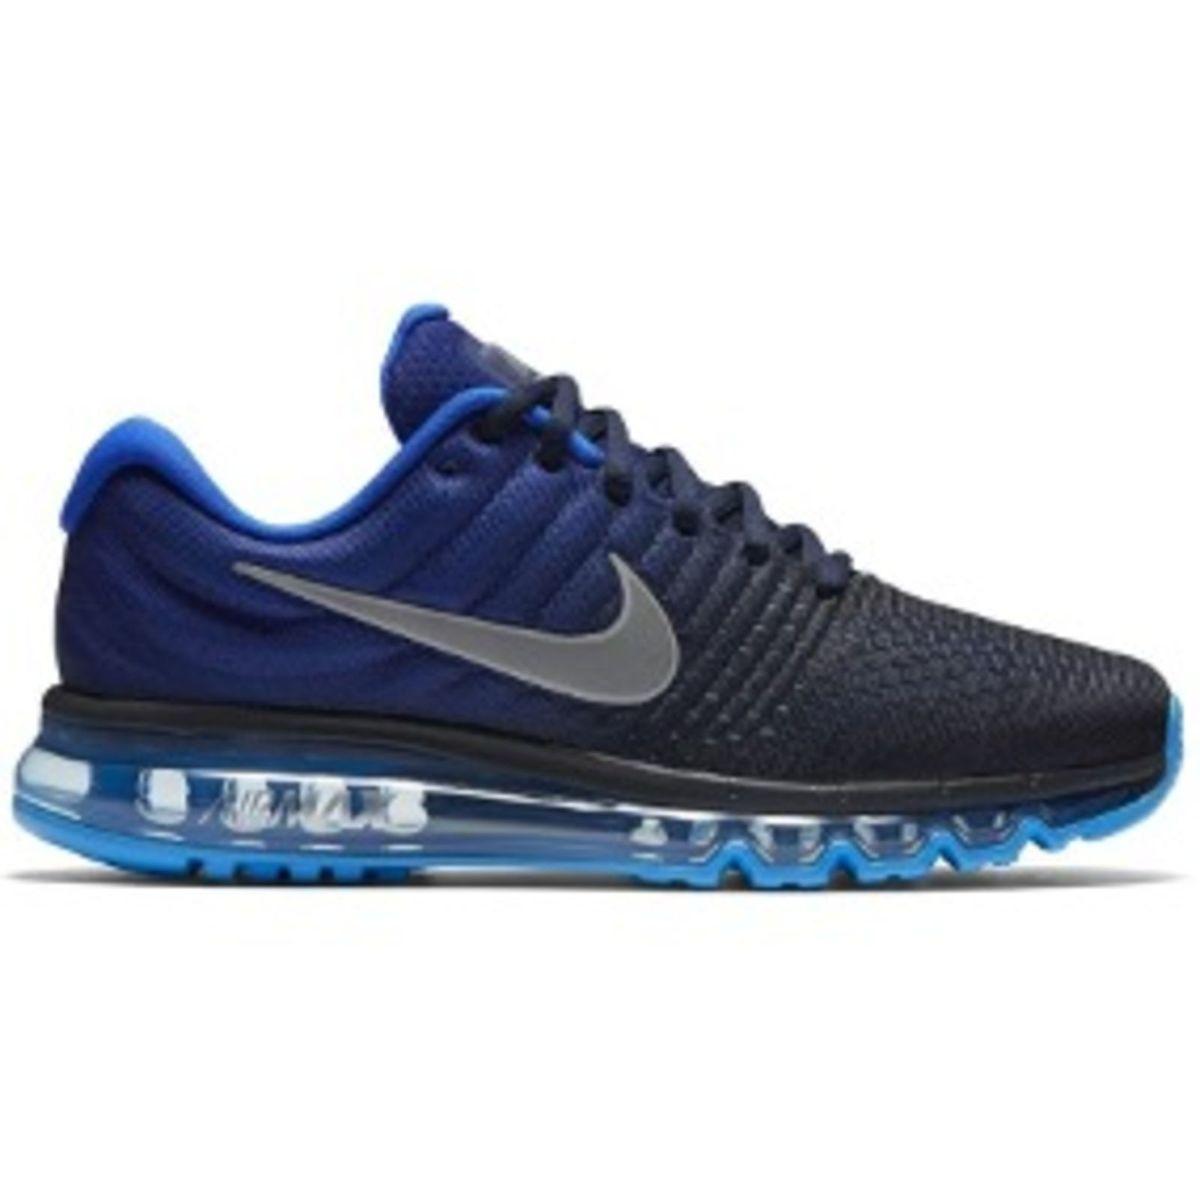 finalizando cámara Chorrito  Tenis Nike Air Max Gel Azul Numero 41 Original | Tênis Feminino Nike Nunca  Usado 30679423 | enjoei